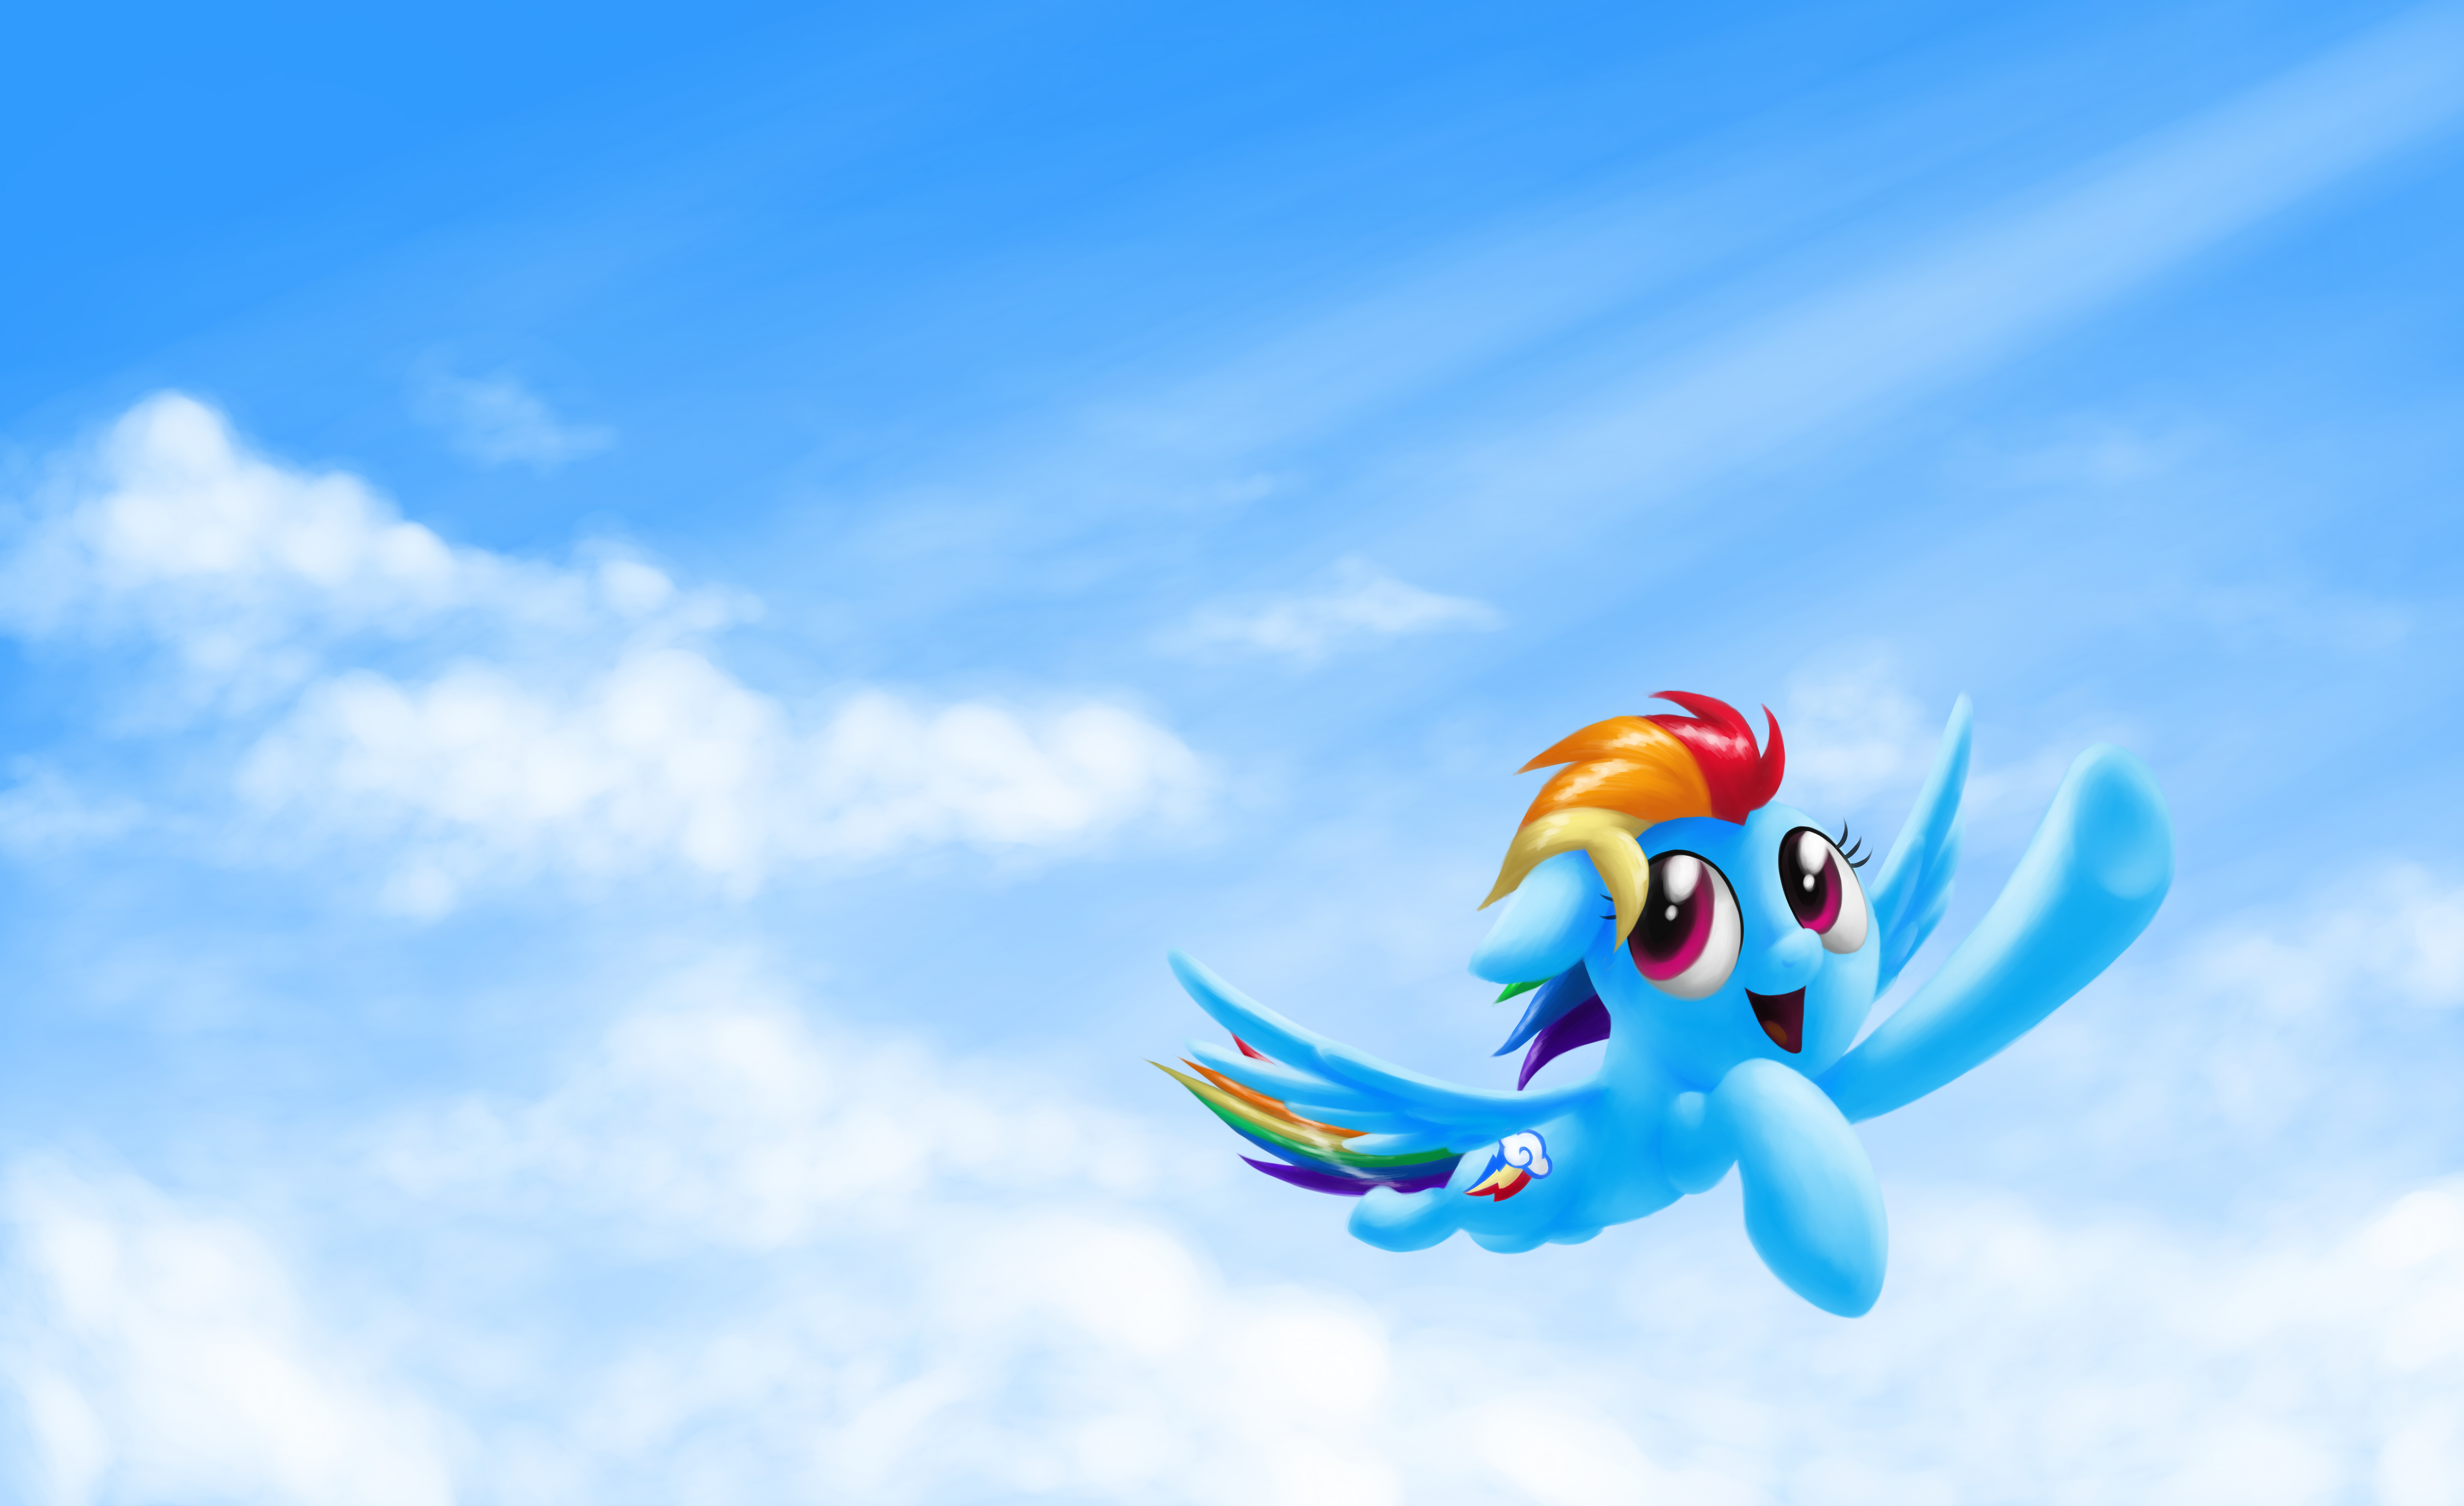 Flying Forward (Wallpaper Version) by verulence